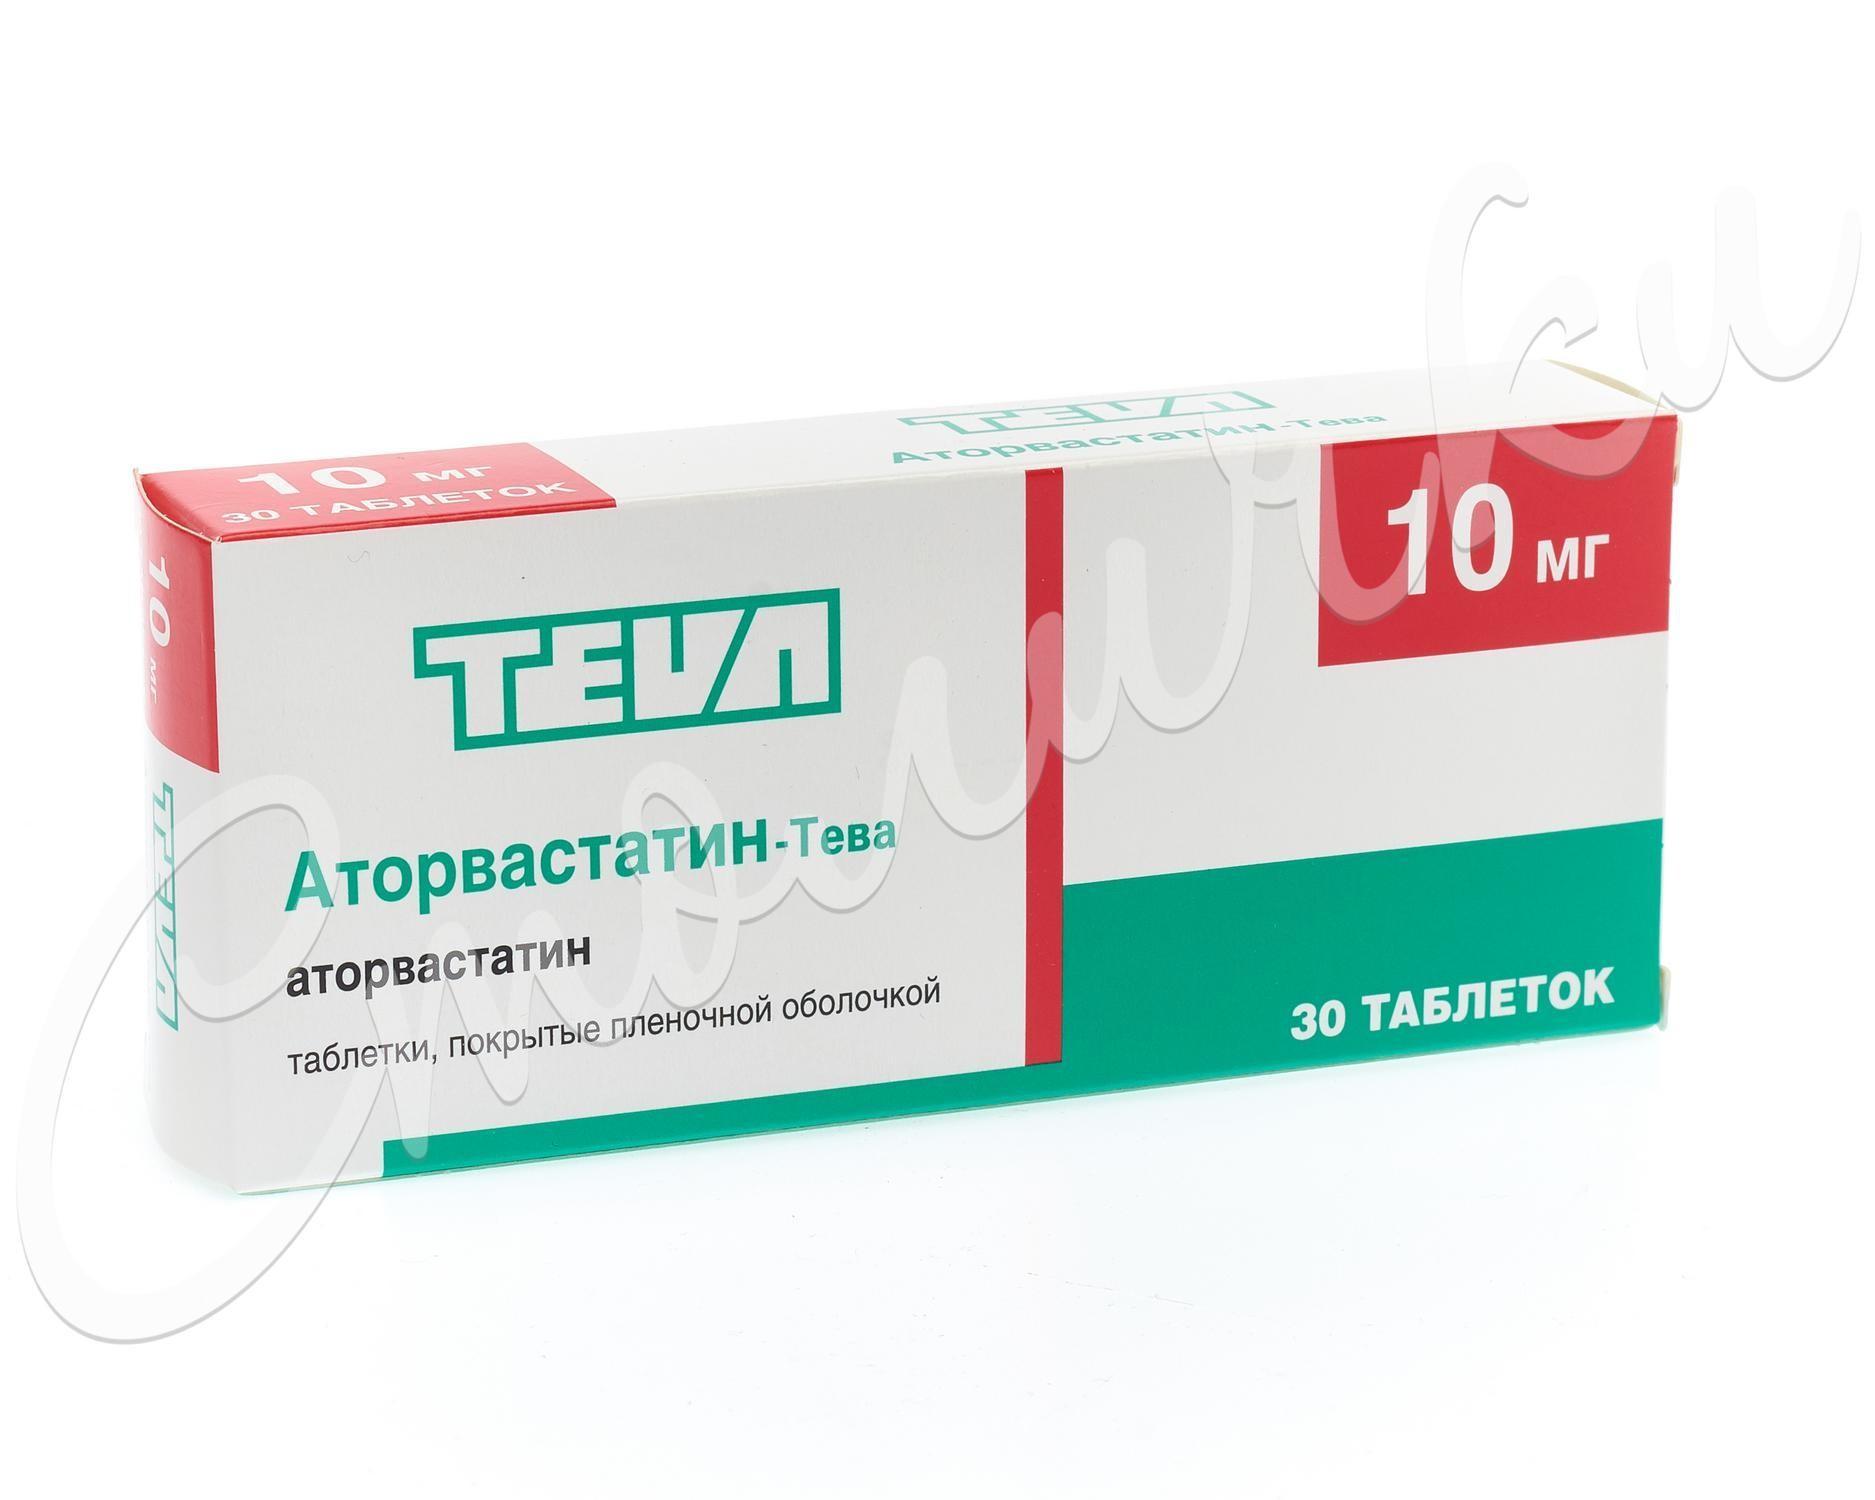 Аналоги лекарства липитор